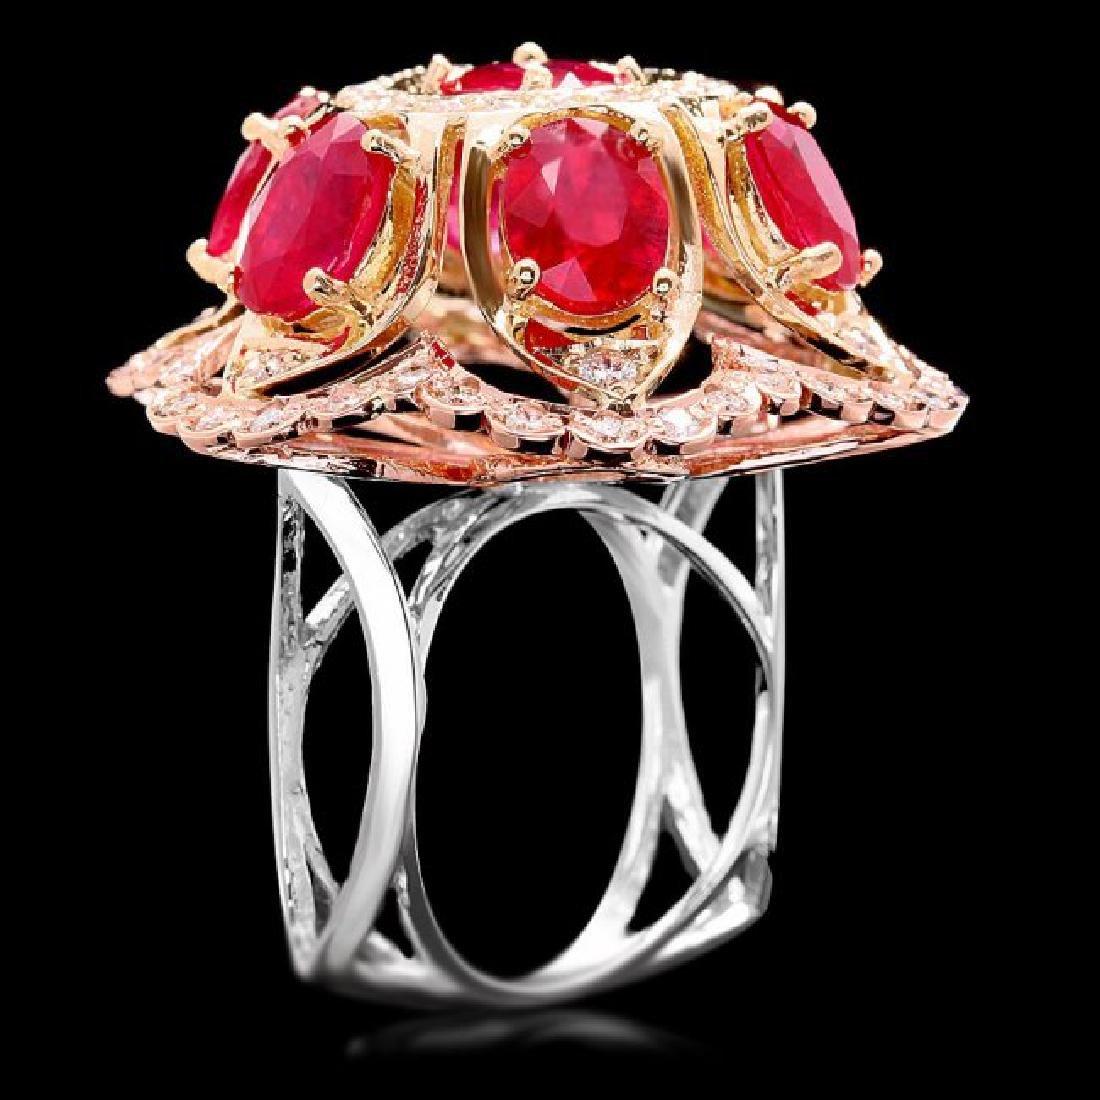 14k Gold 12.00ct Ruby 1.35ct Diamond Ring - 2